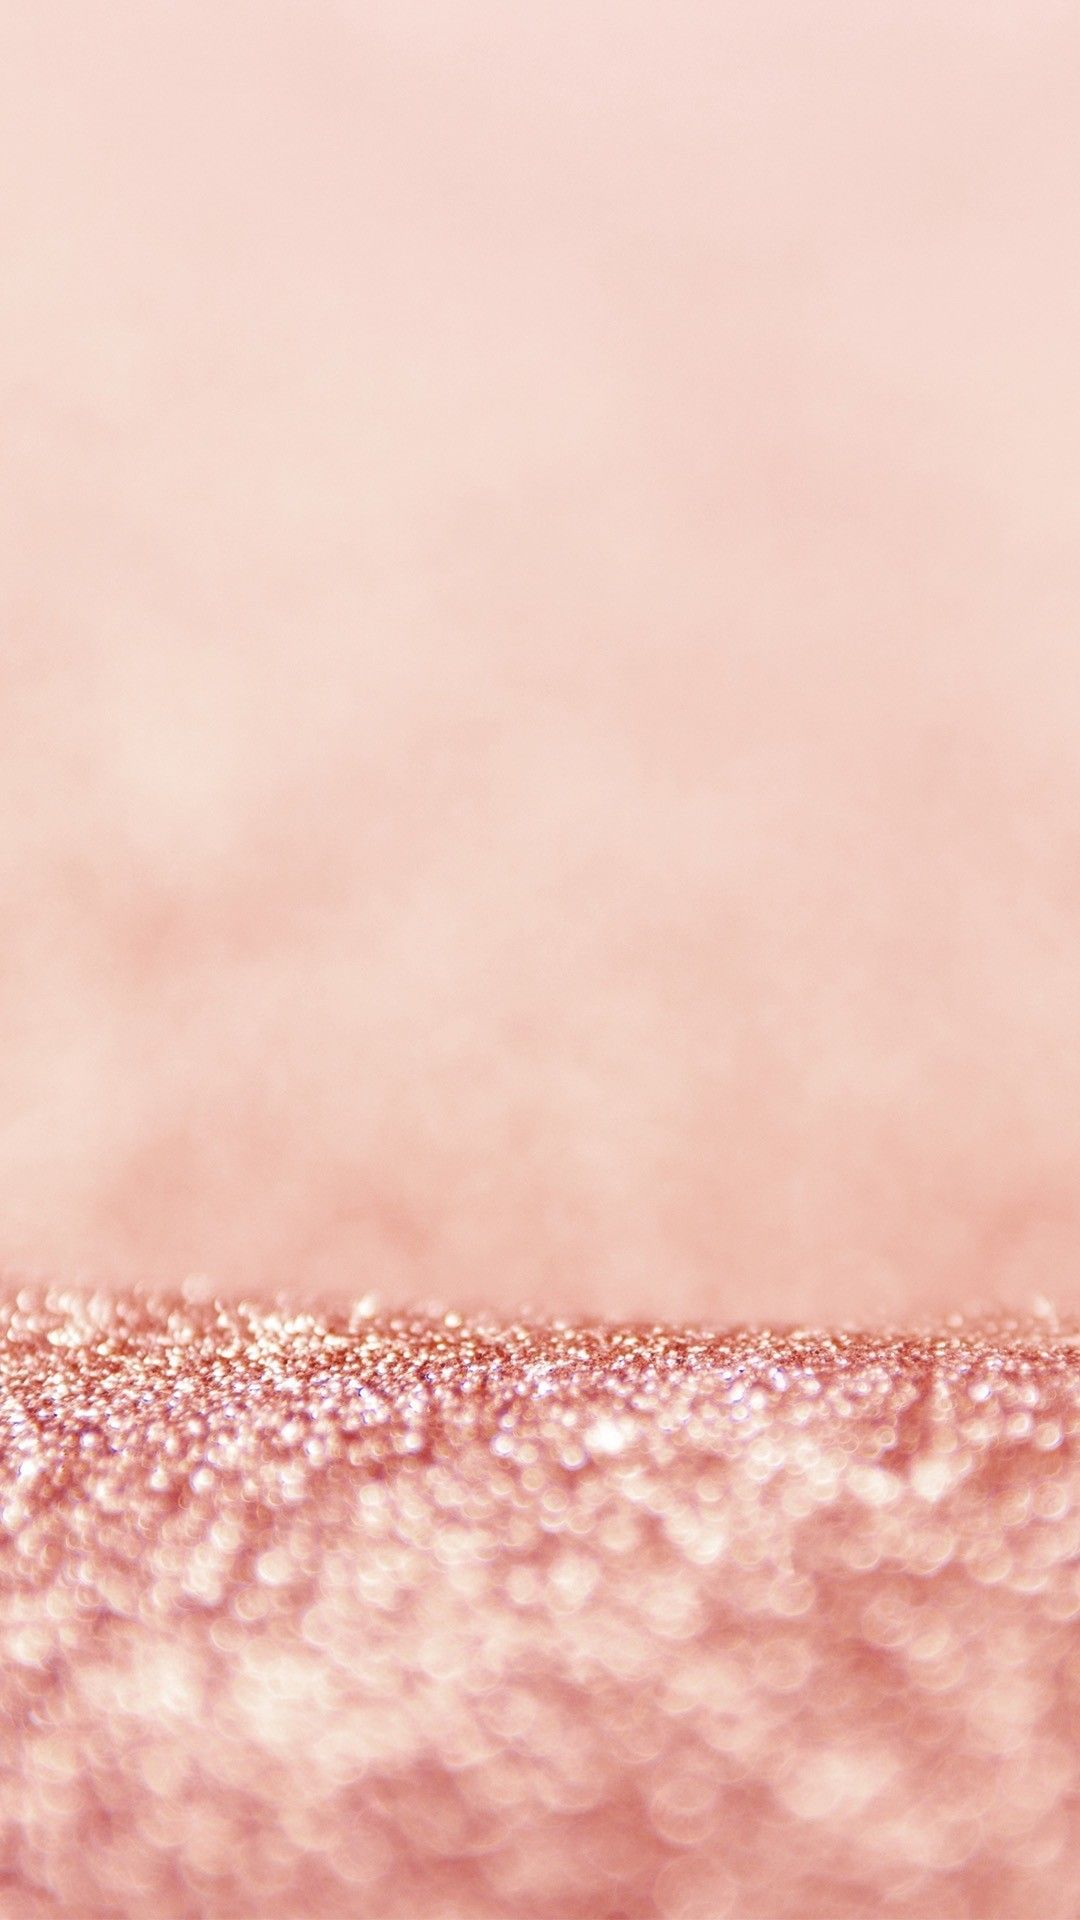 PhoneWallpaper Android Wallpaper HD Rose Gold Glitter